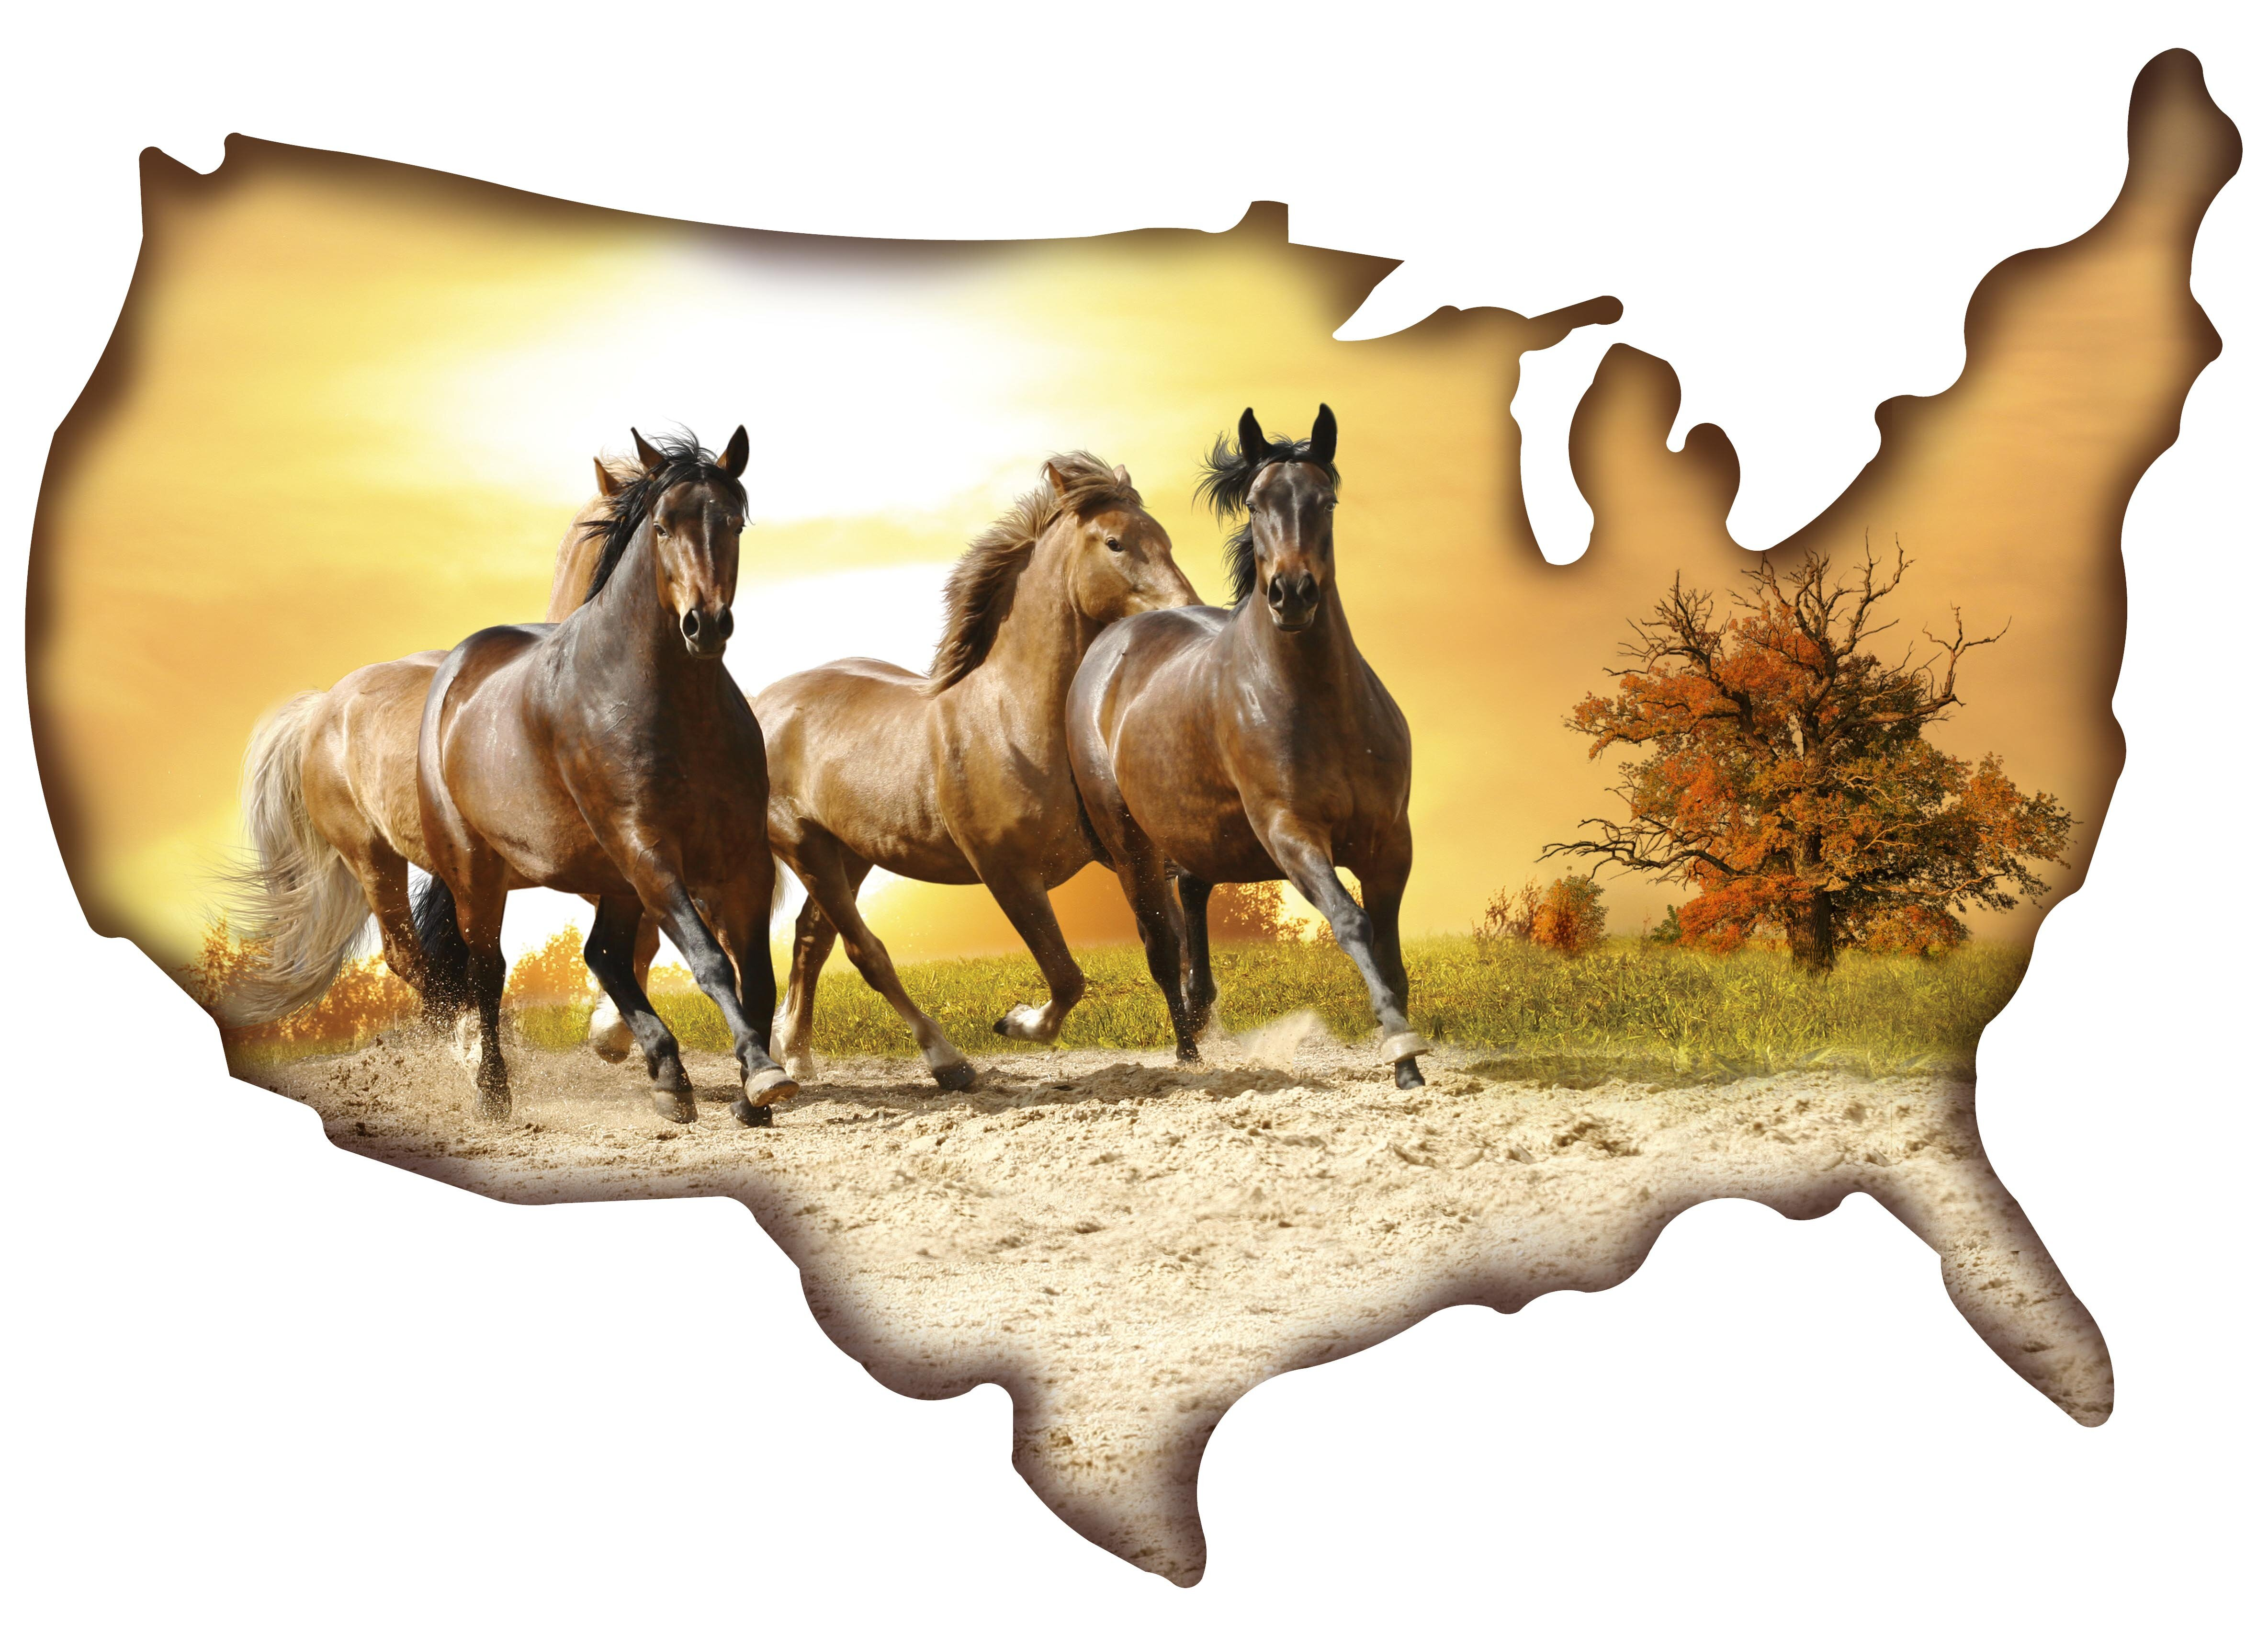 Beautiful Metal Wall Art Horses Image - The Wall Art Decorations ...